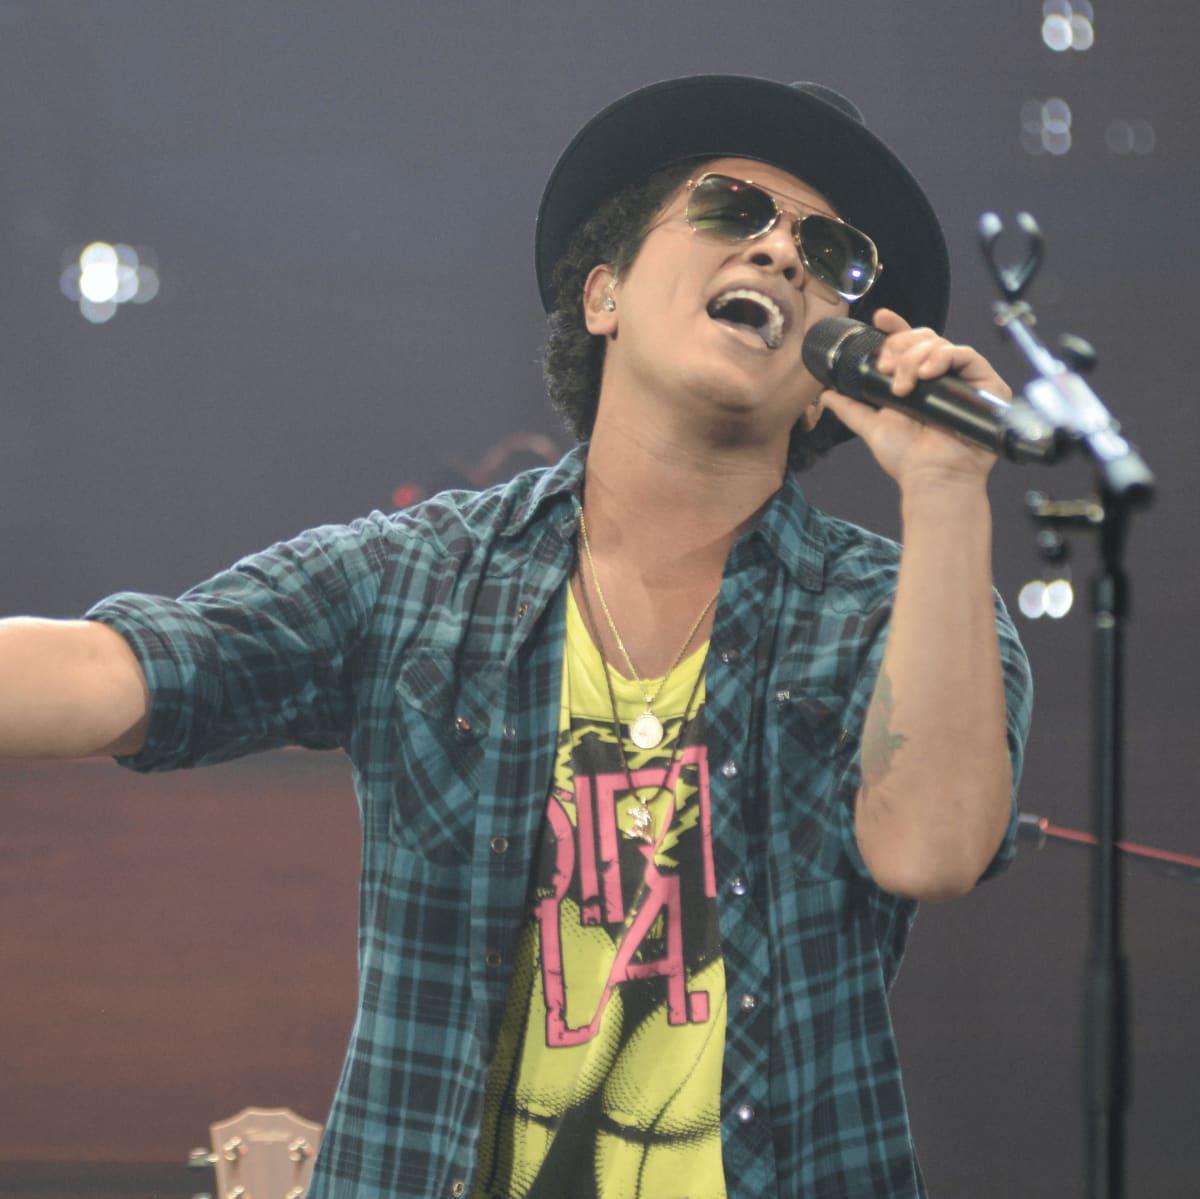 0007, RodeoHouston, Bruno Mars concert, March 2013